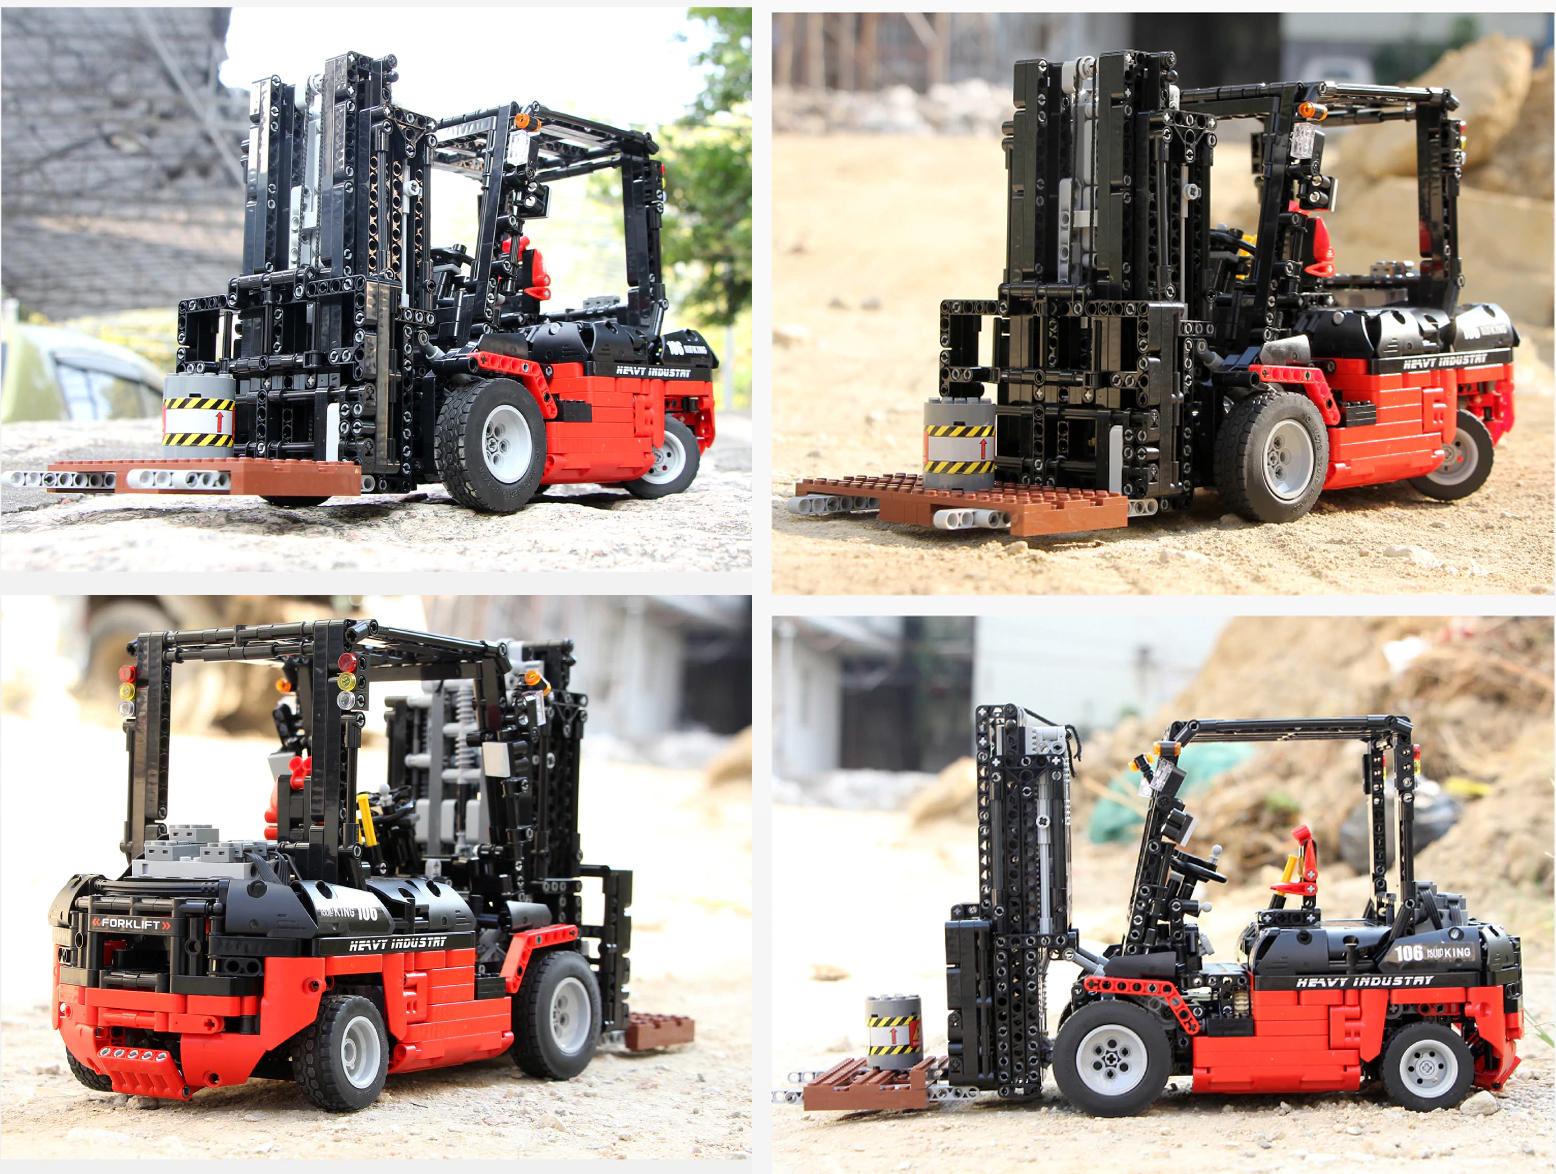 Mould King 13106 Technik Bausteine Gabelstapler Fernbedienung mit Power Function